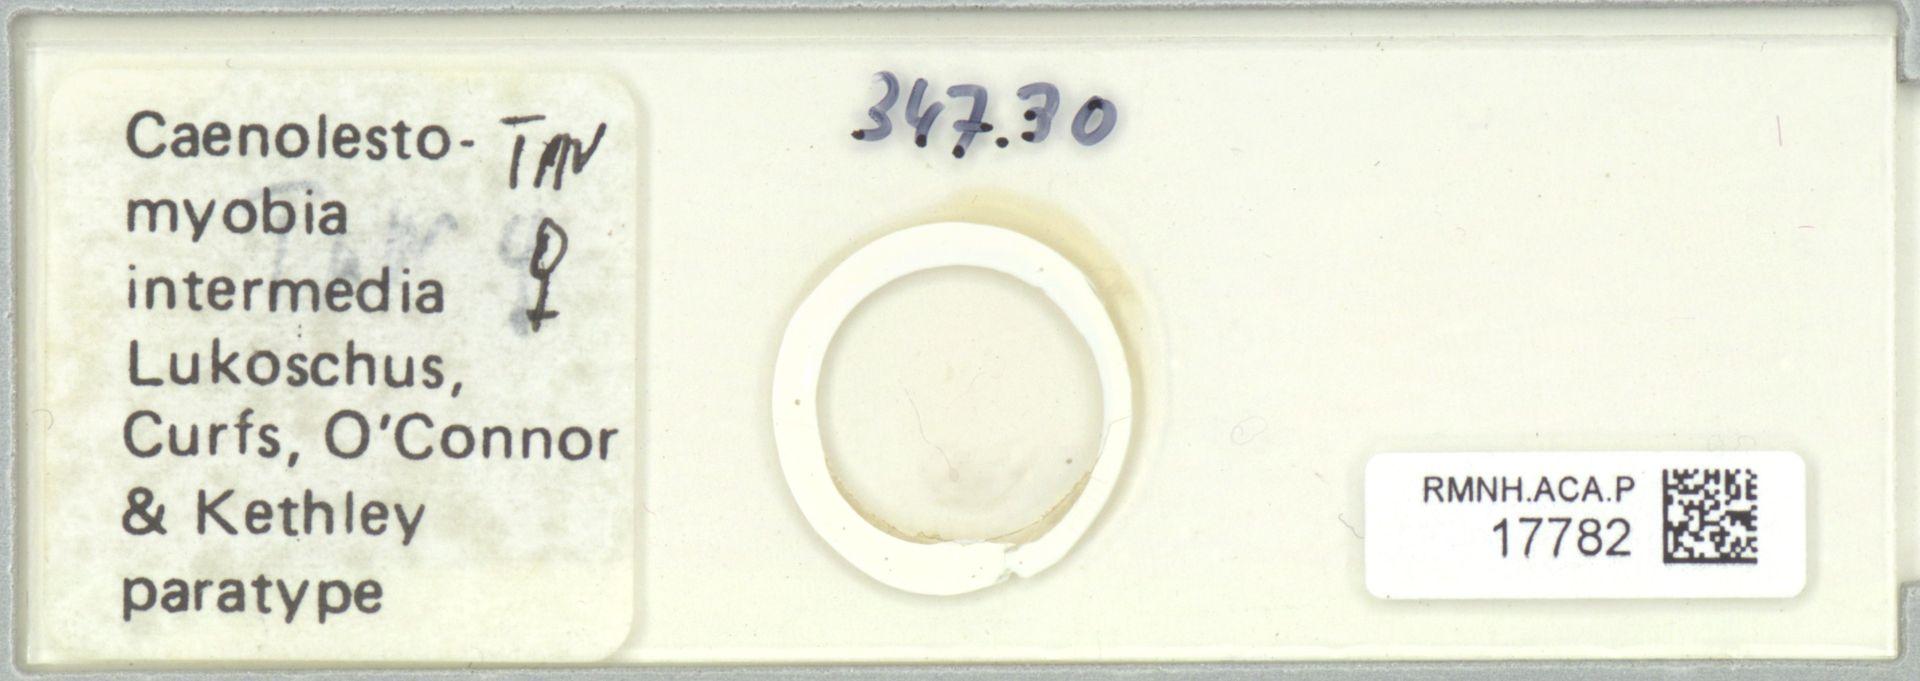 RMNH.ACA.P.17782 | Caenolestomyobia intermedia